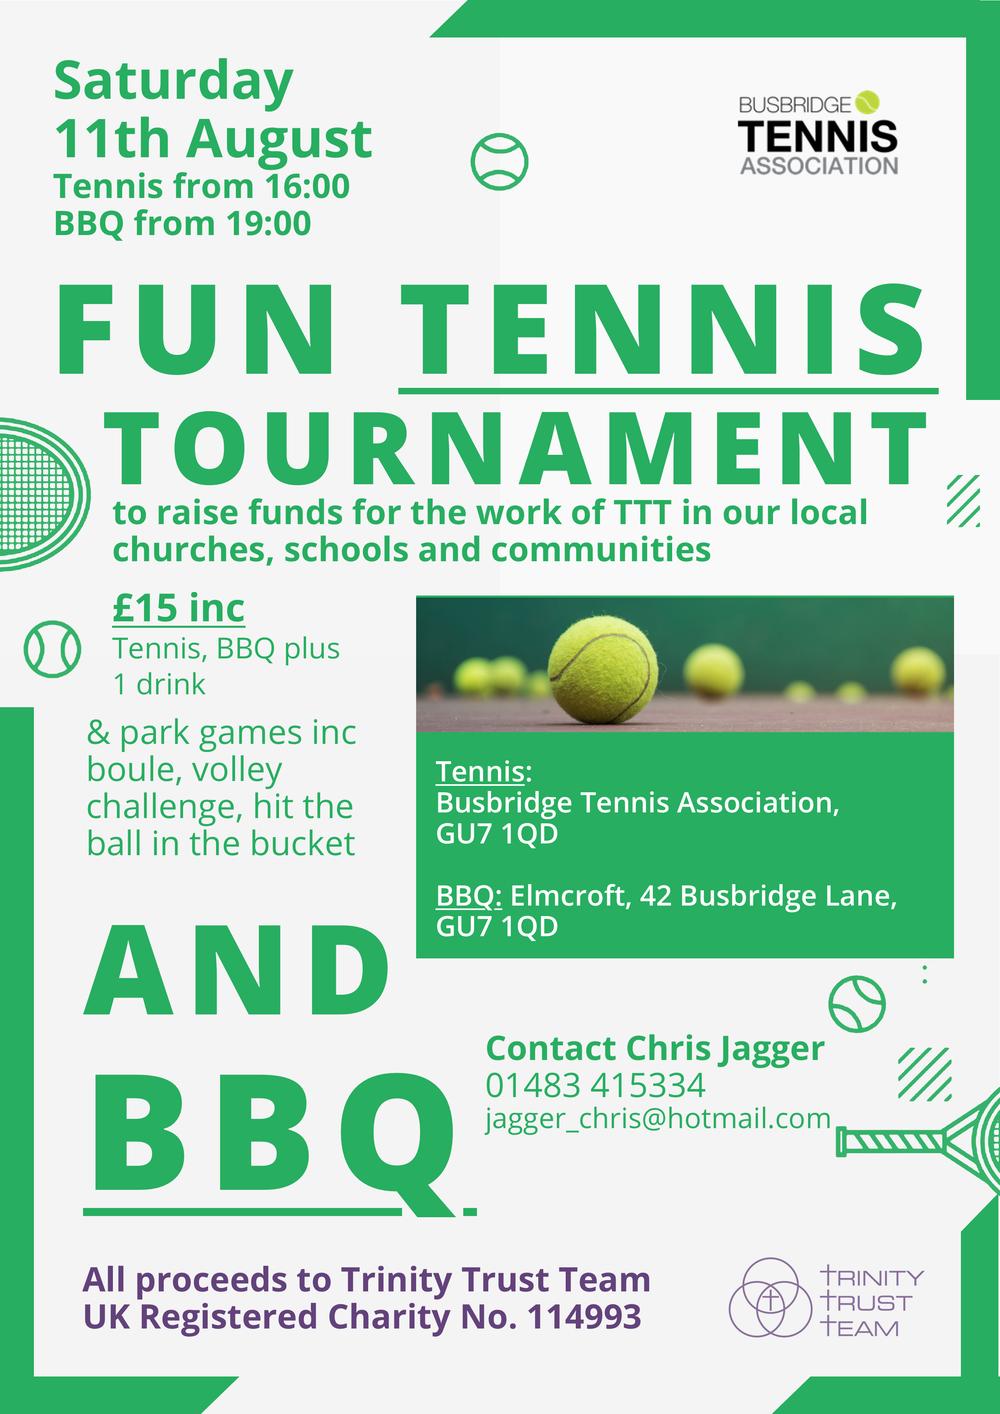 Trinity Trust Team Tennis and BBQ Fundraiser